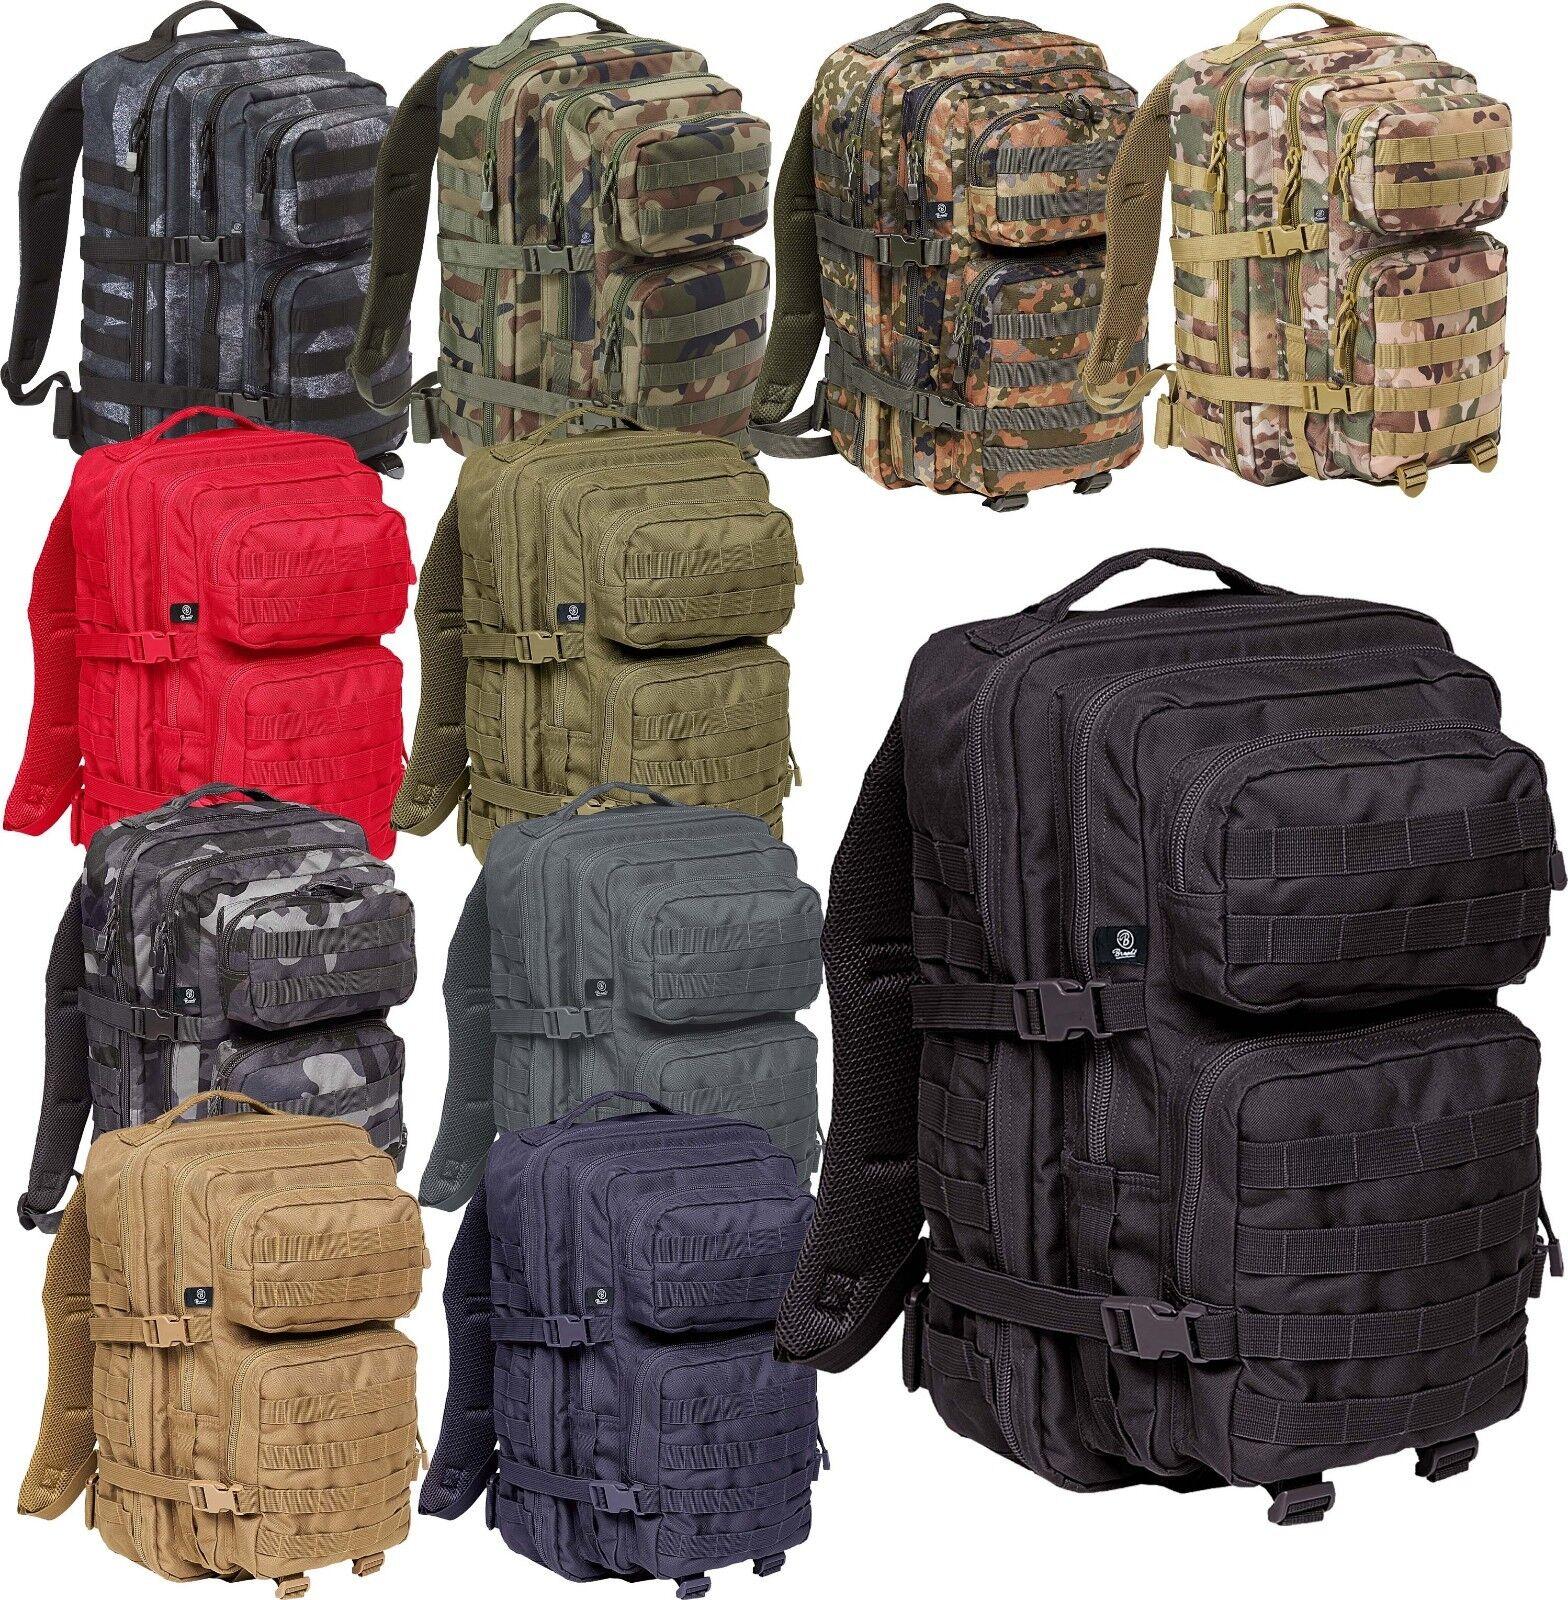 65L Rucksack Backpack Bundeswehr Armeerucksack Daypack camouflage BW Army Tasche